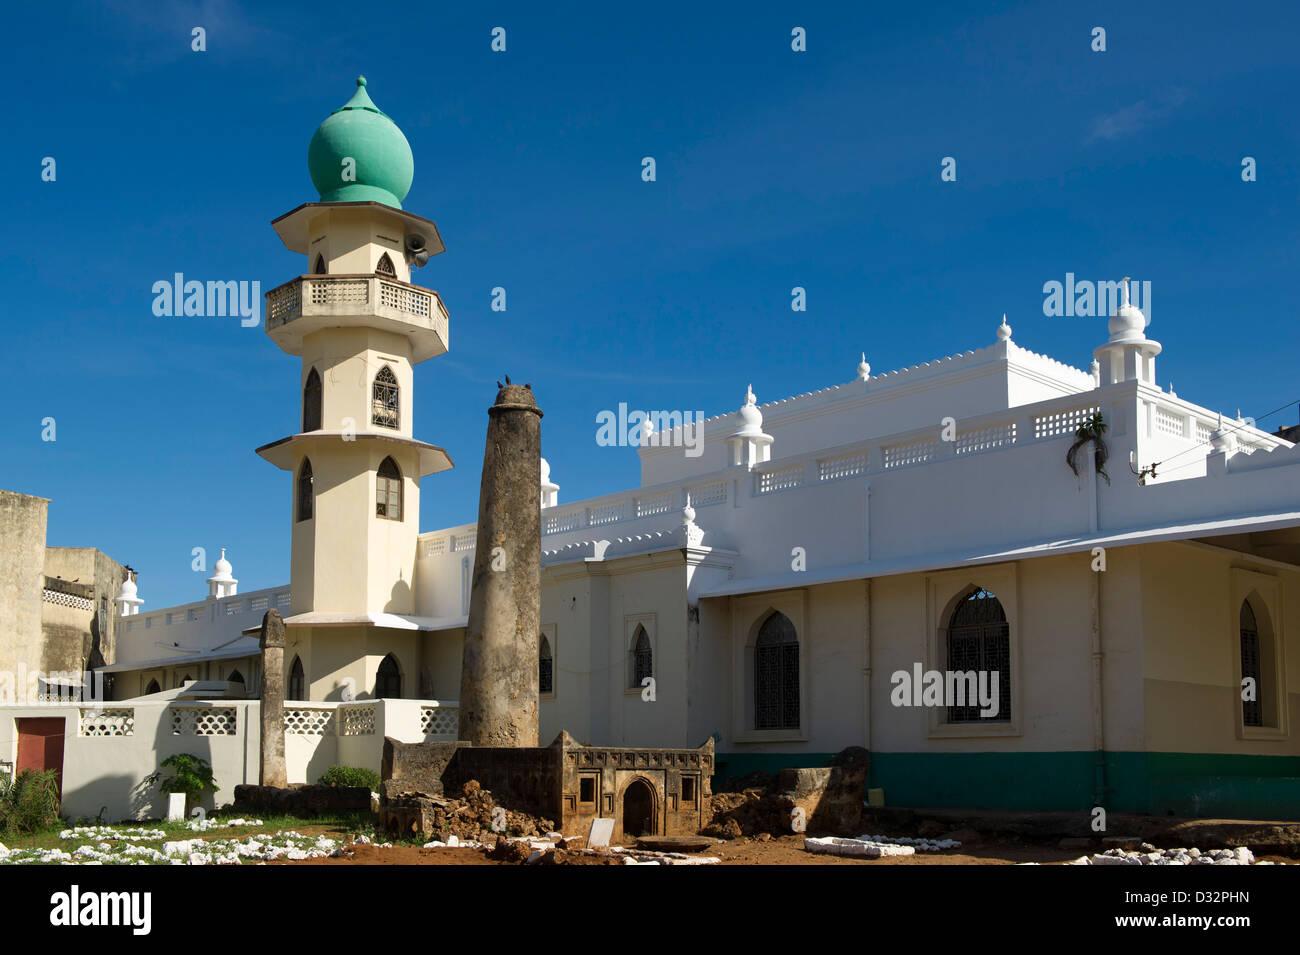 Ancient pillar tomb in front of Juma mosque, Malindi, Kenya - Stock Image